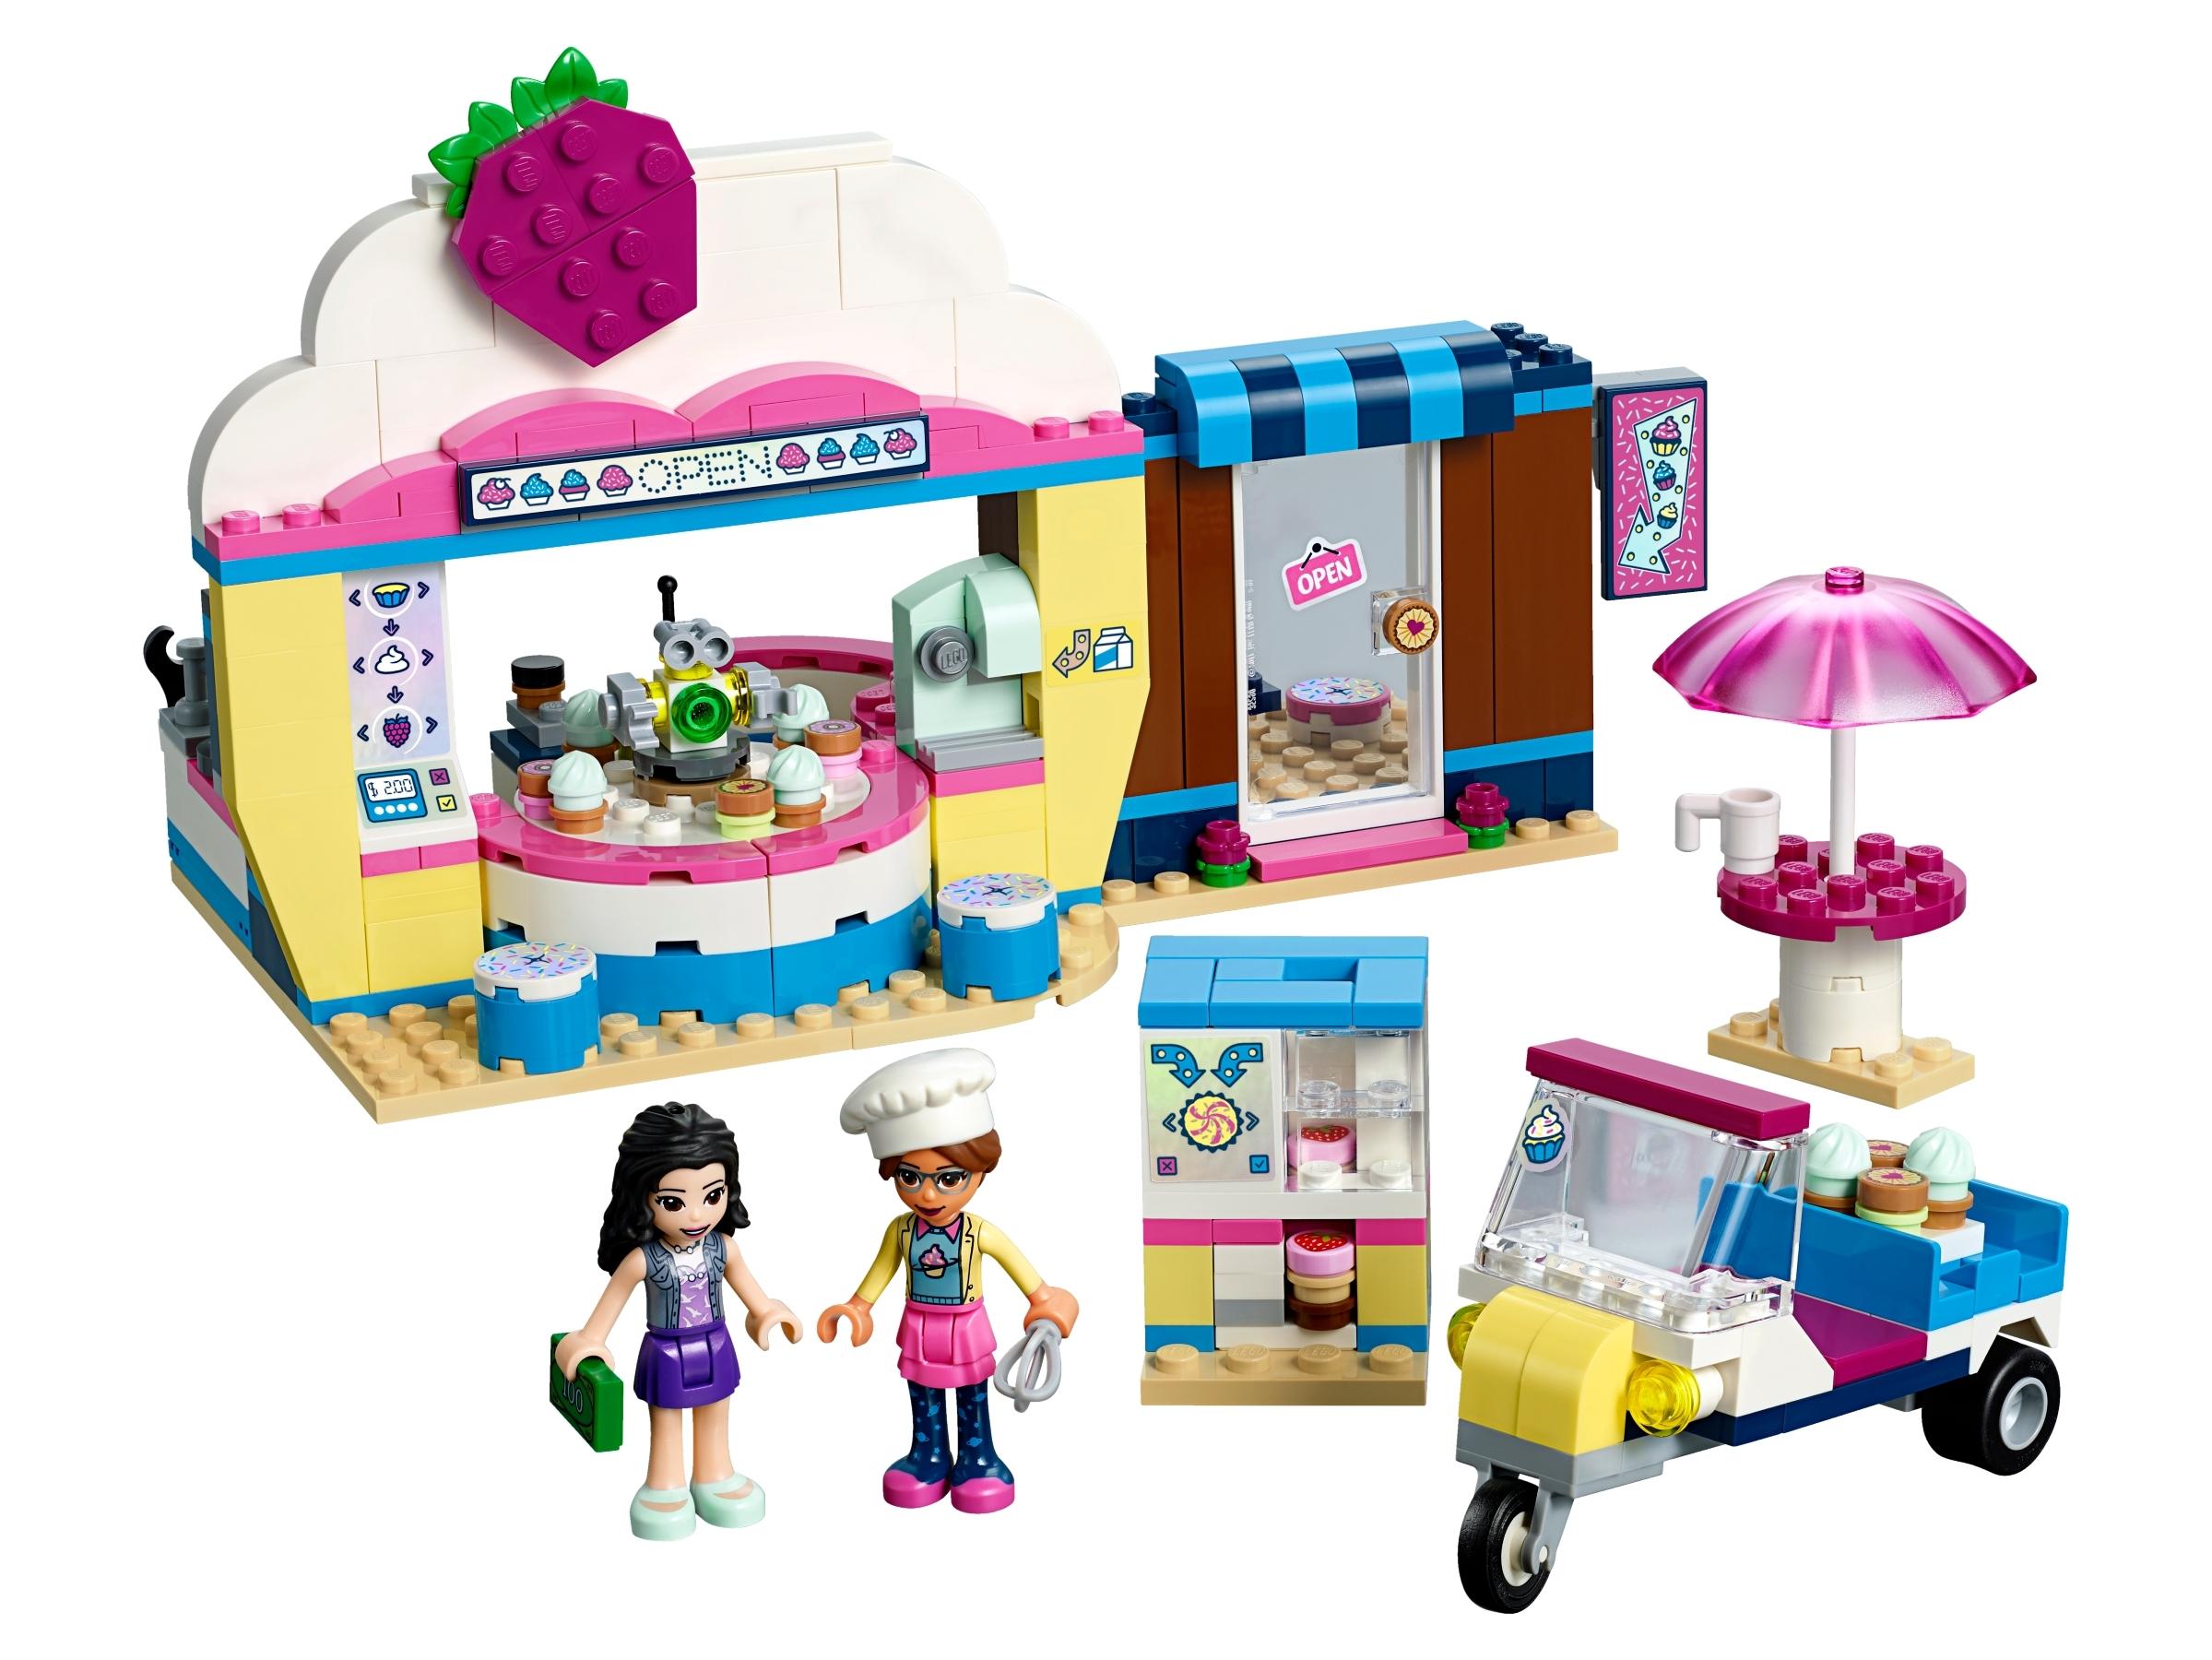 LEGO Friends Olivia's Cupcake Café 41366 Building Kit 335 Piece New 2019